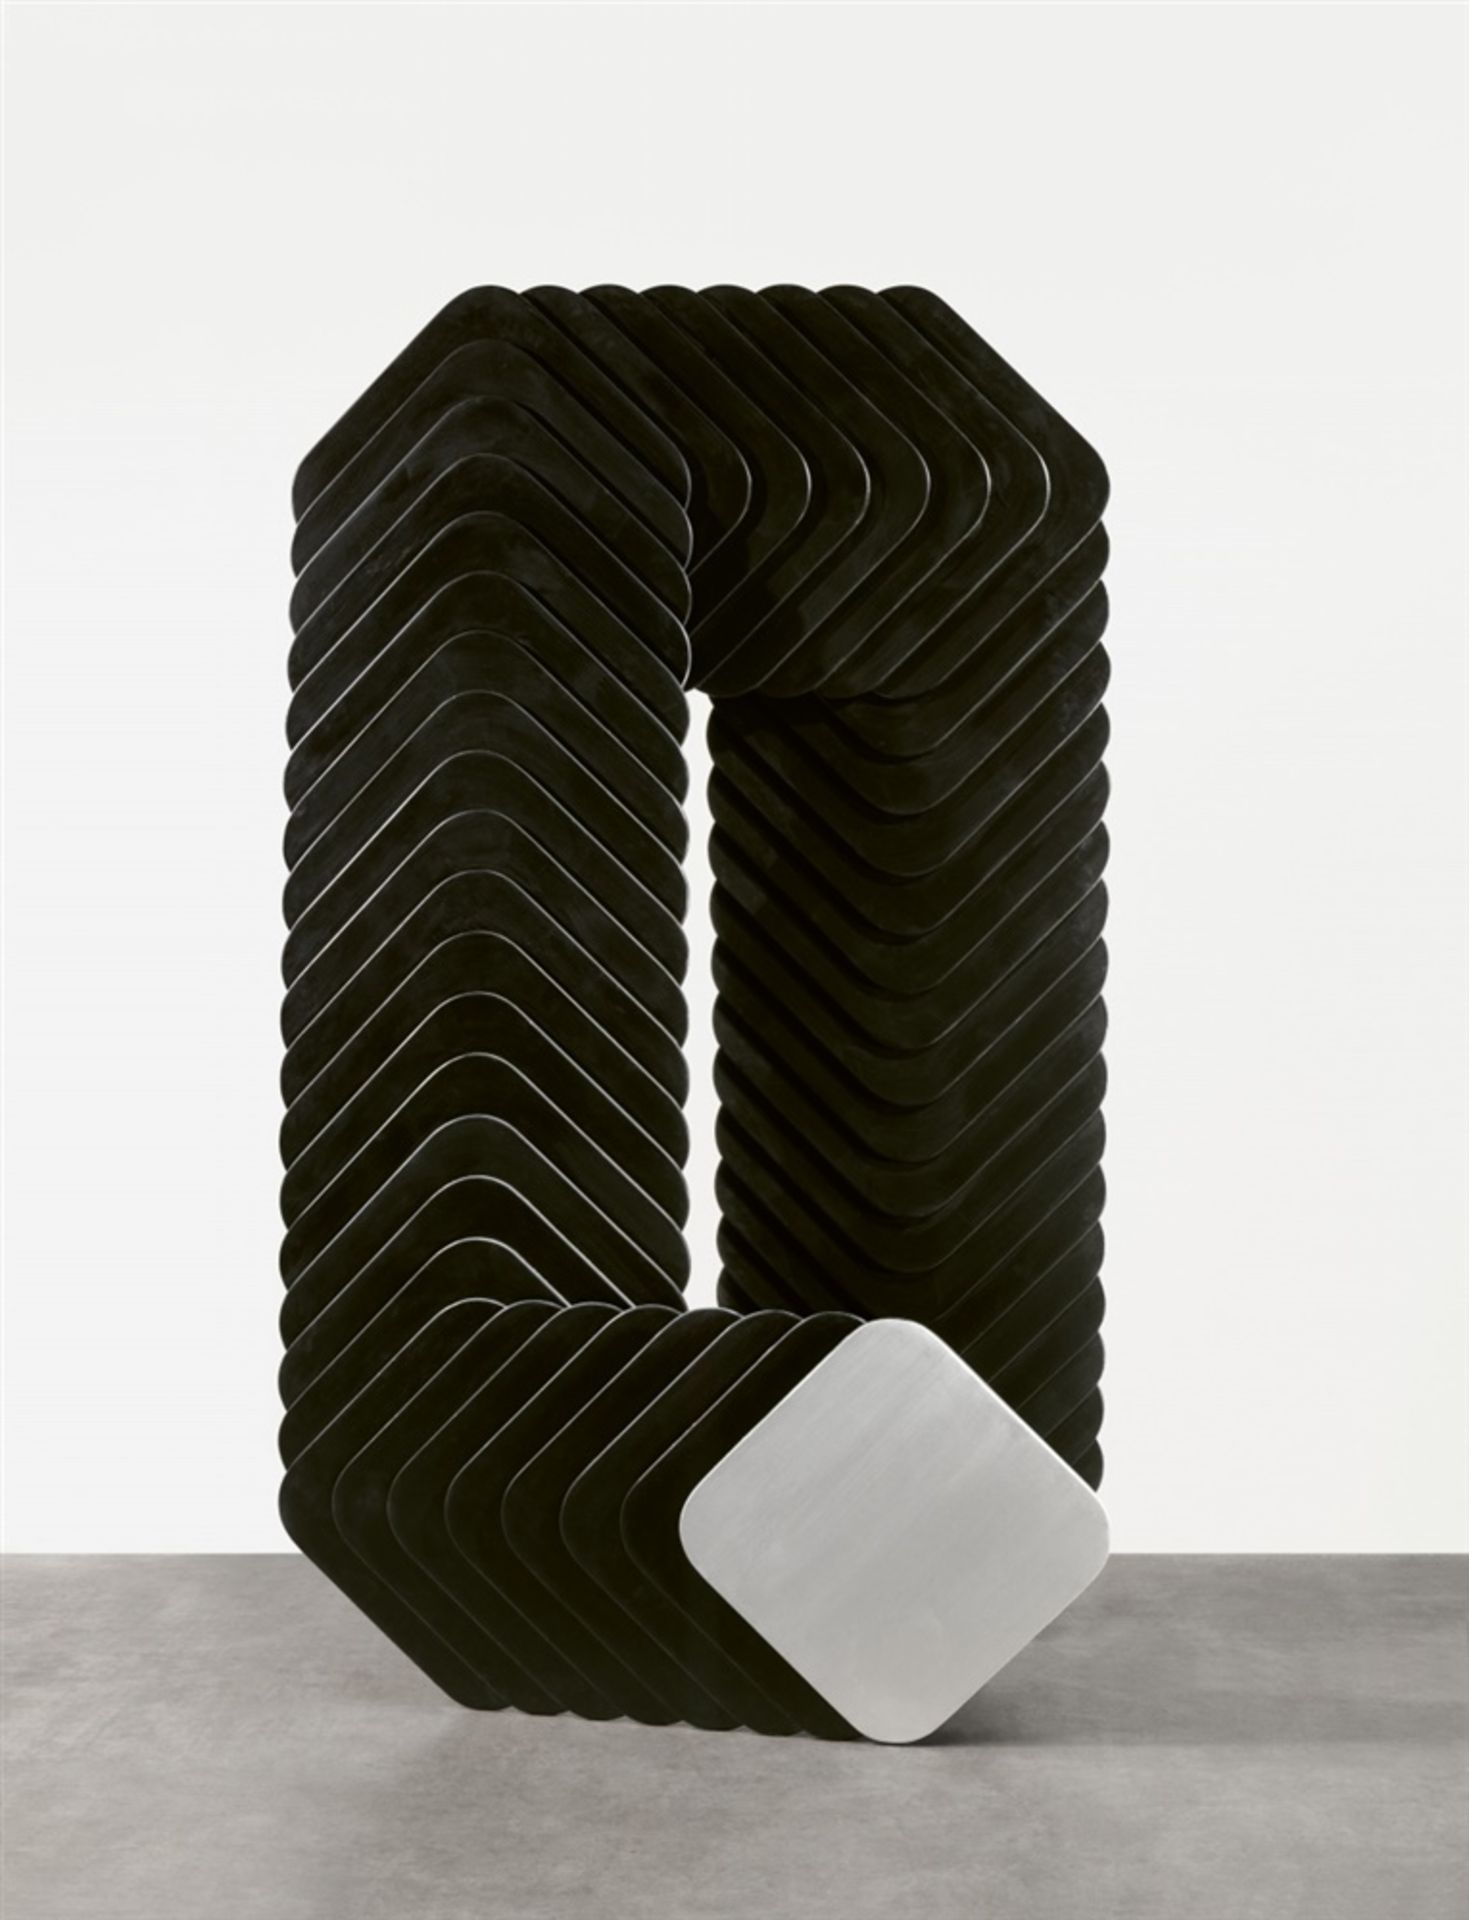 Thomas LenkTorskulptur